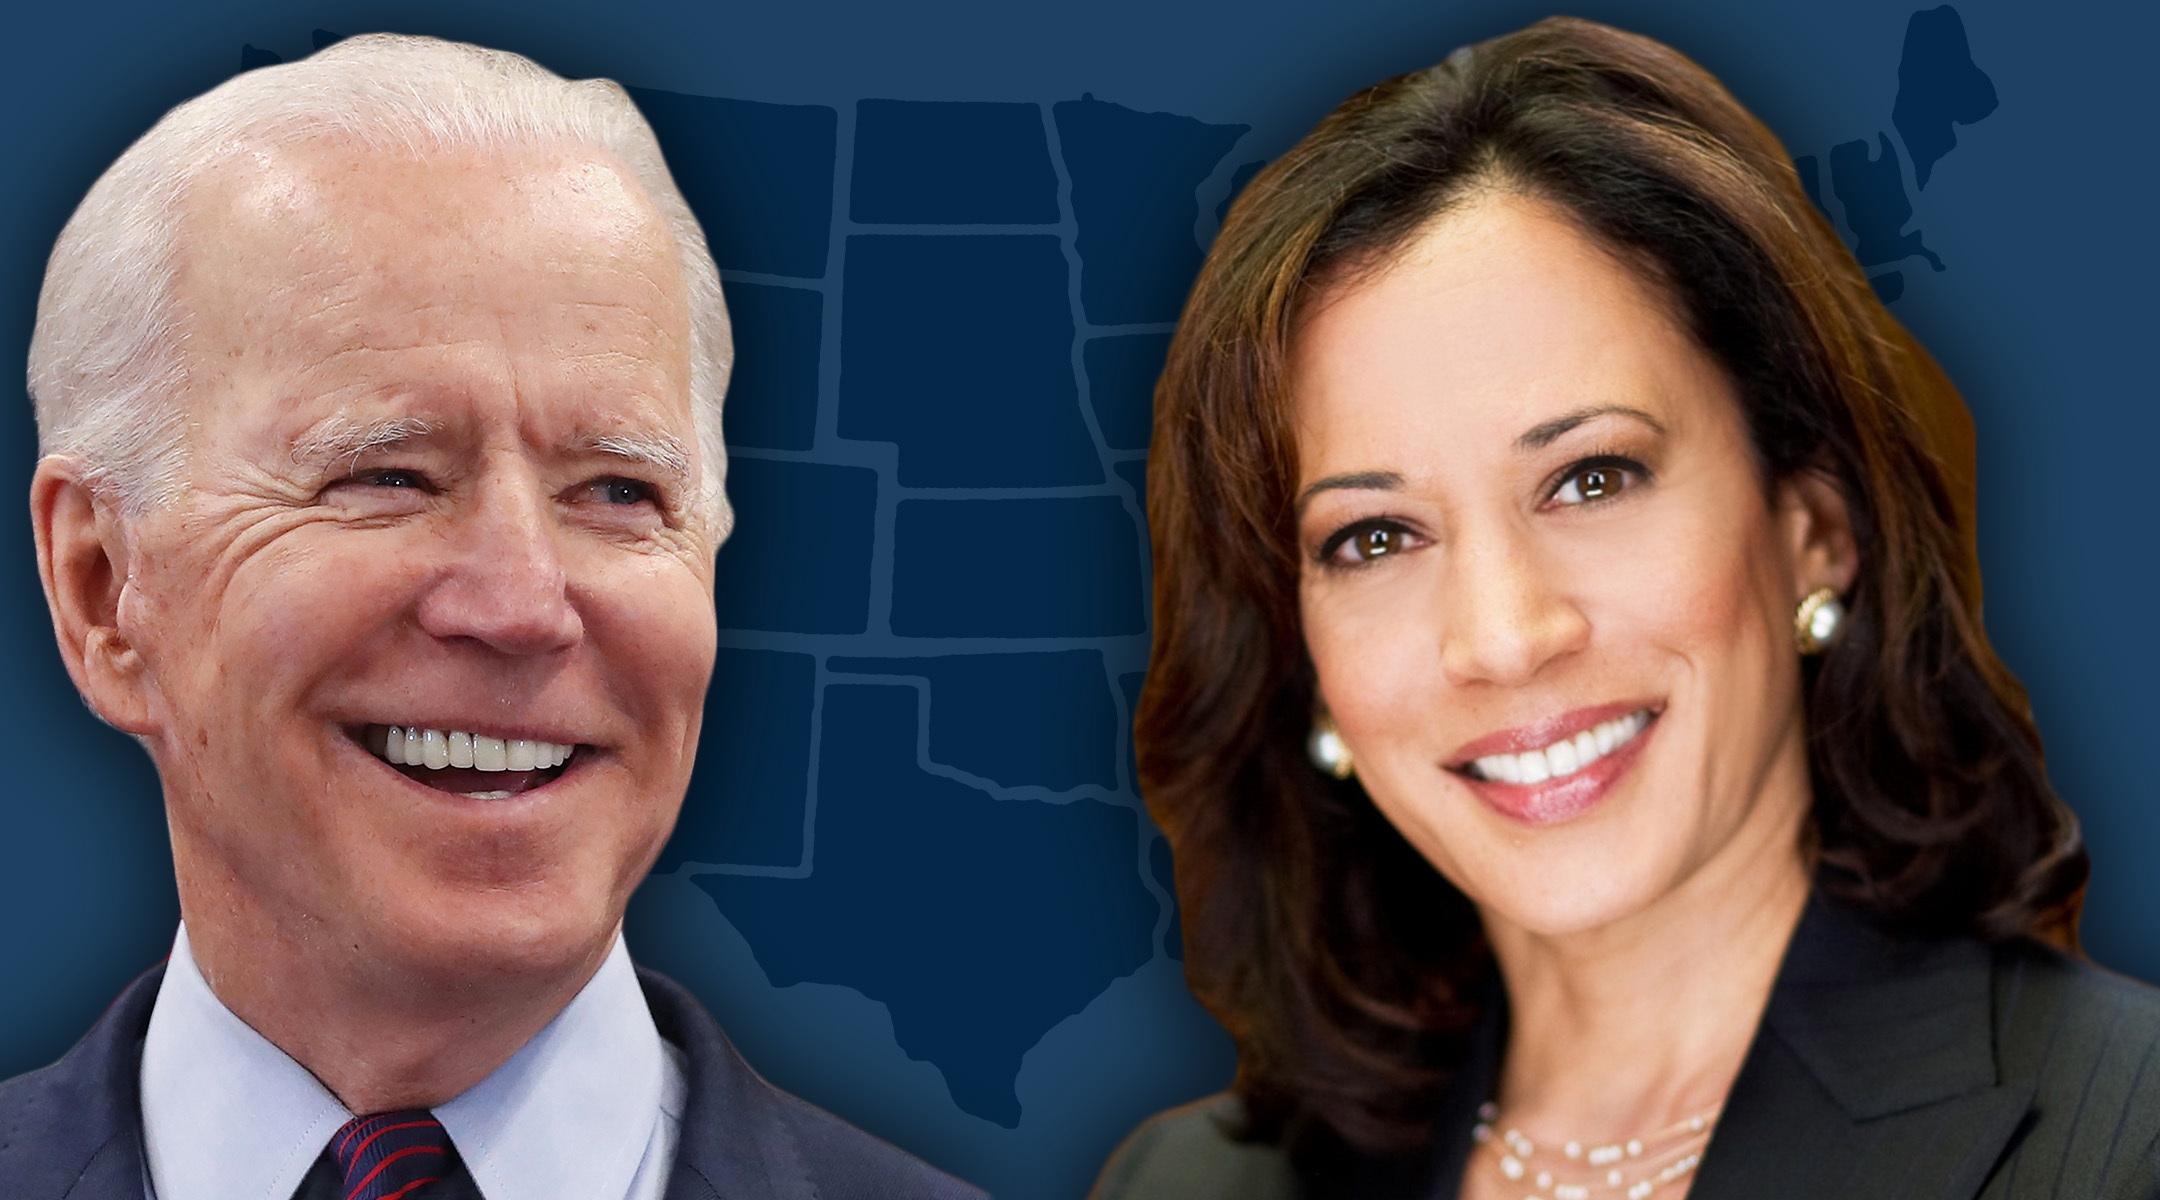 Kamala Harris is Joe Biden's VP pick — here's what Jewish voters should know